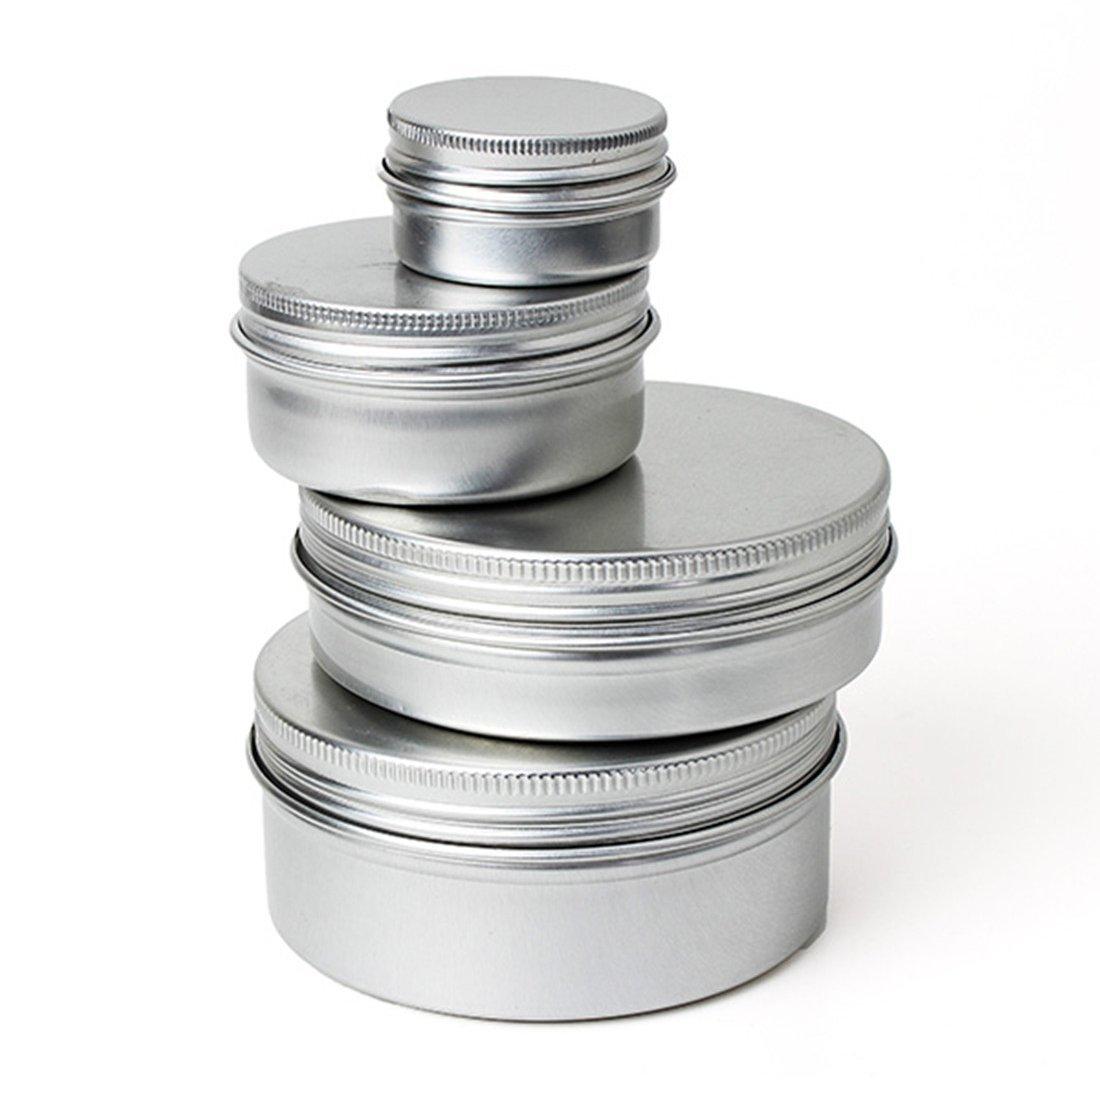 Cosmetic travel Container - SODIAL(R) 10pcs Aluminium Nail Art/Cosmetic/Travel/Cream Pot Jar Tin Balms Container Round (50ml) 059196